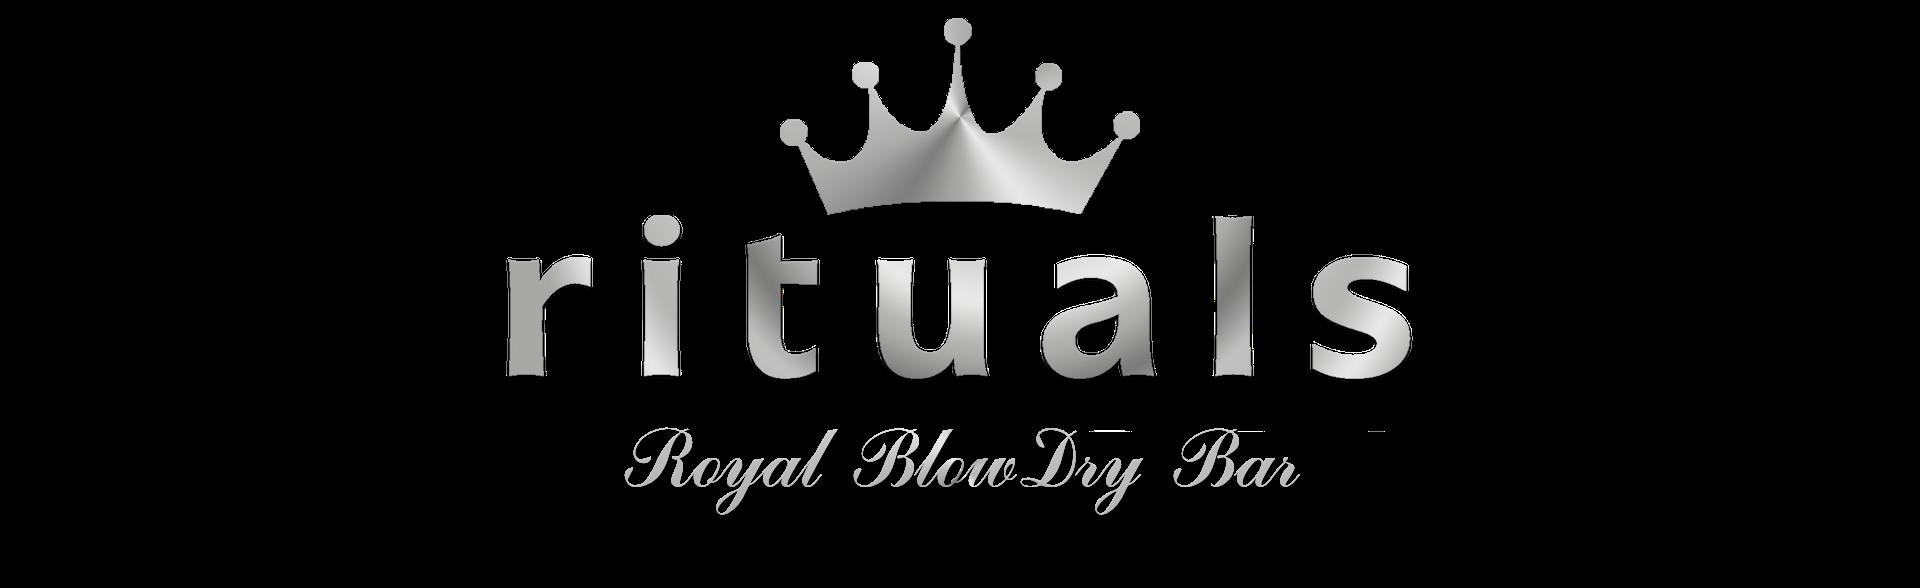 Royal Blow Dry Bar